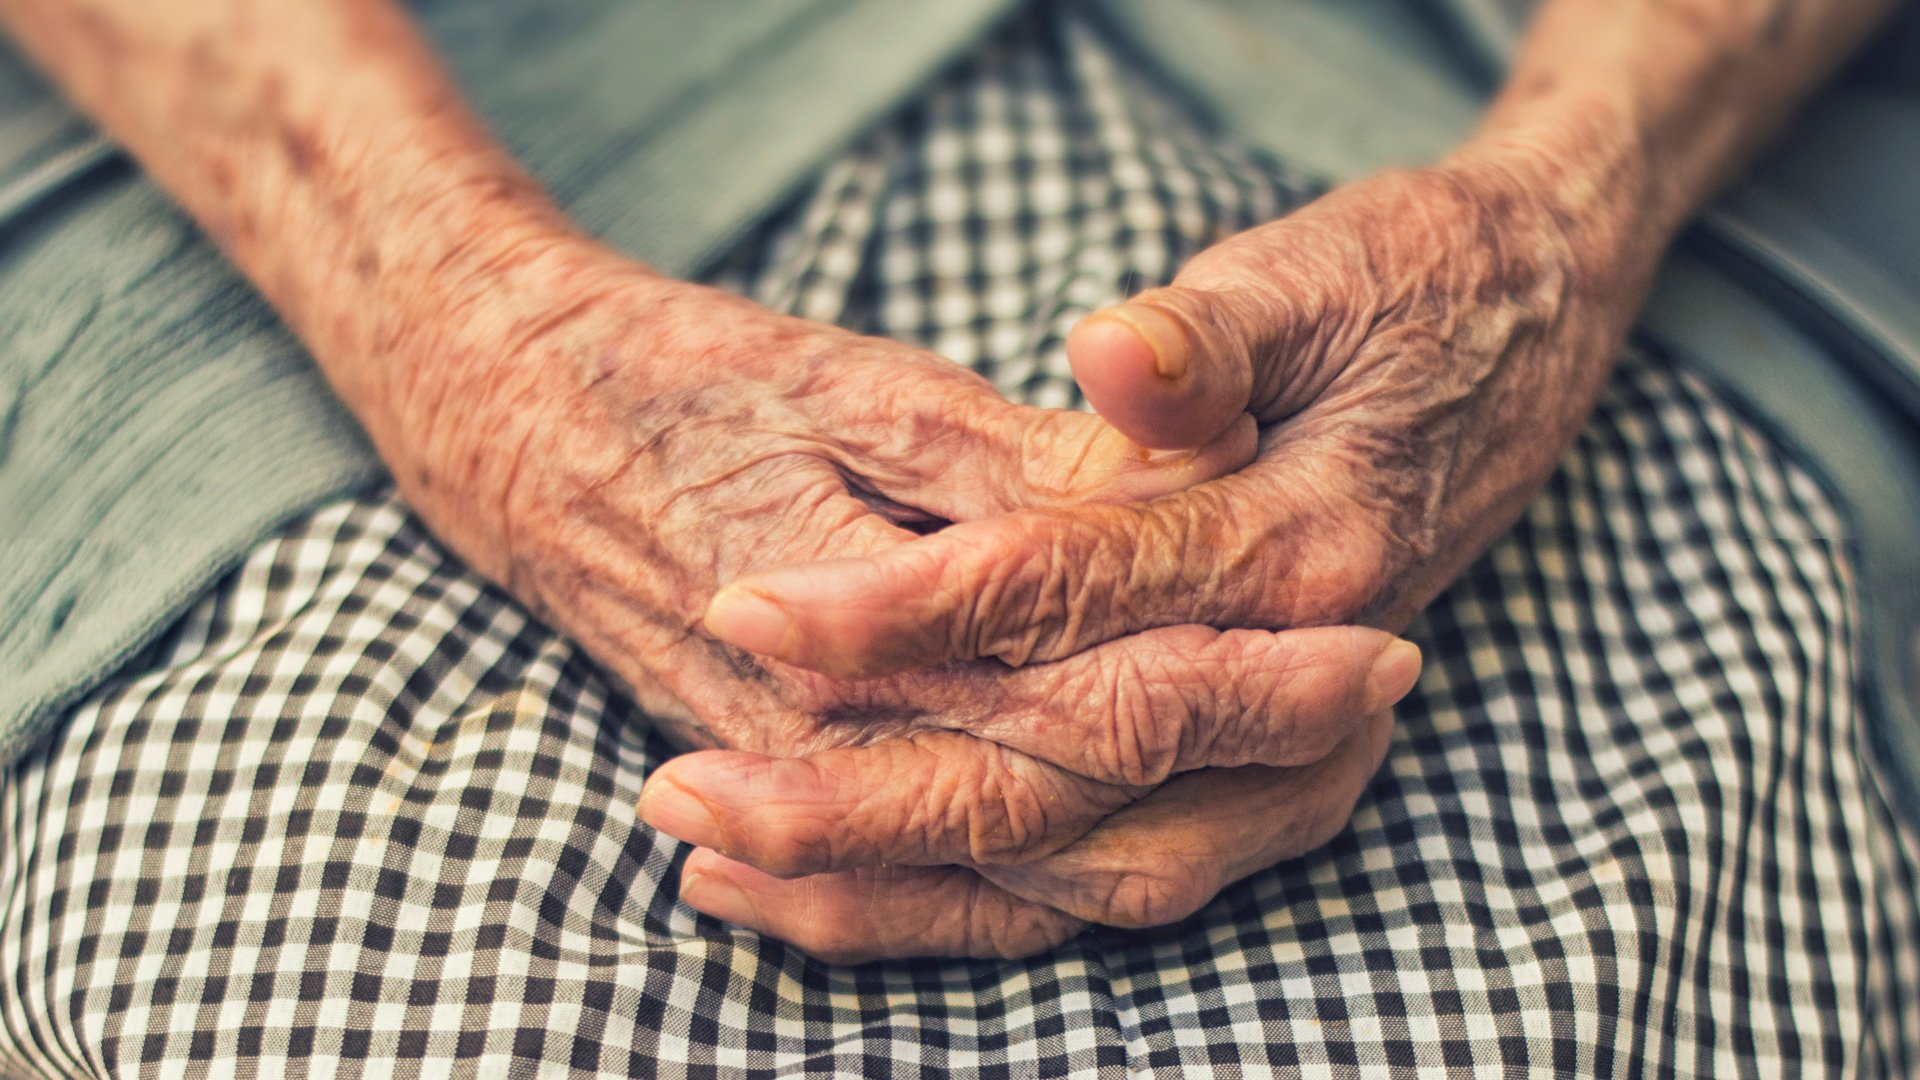 Mani di una signora ultracentenaria